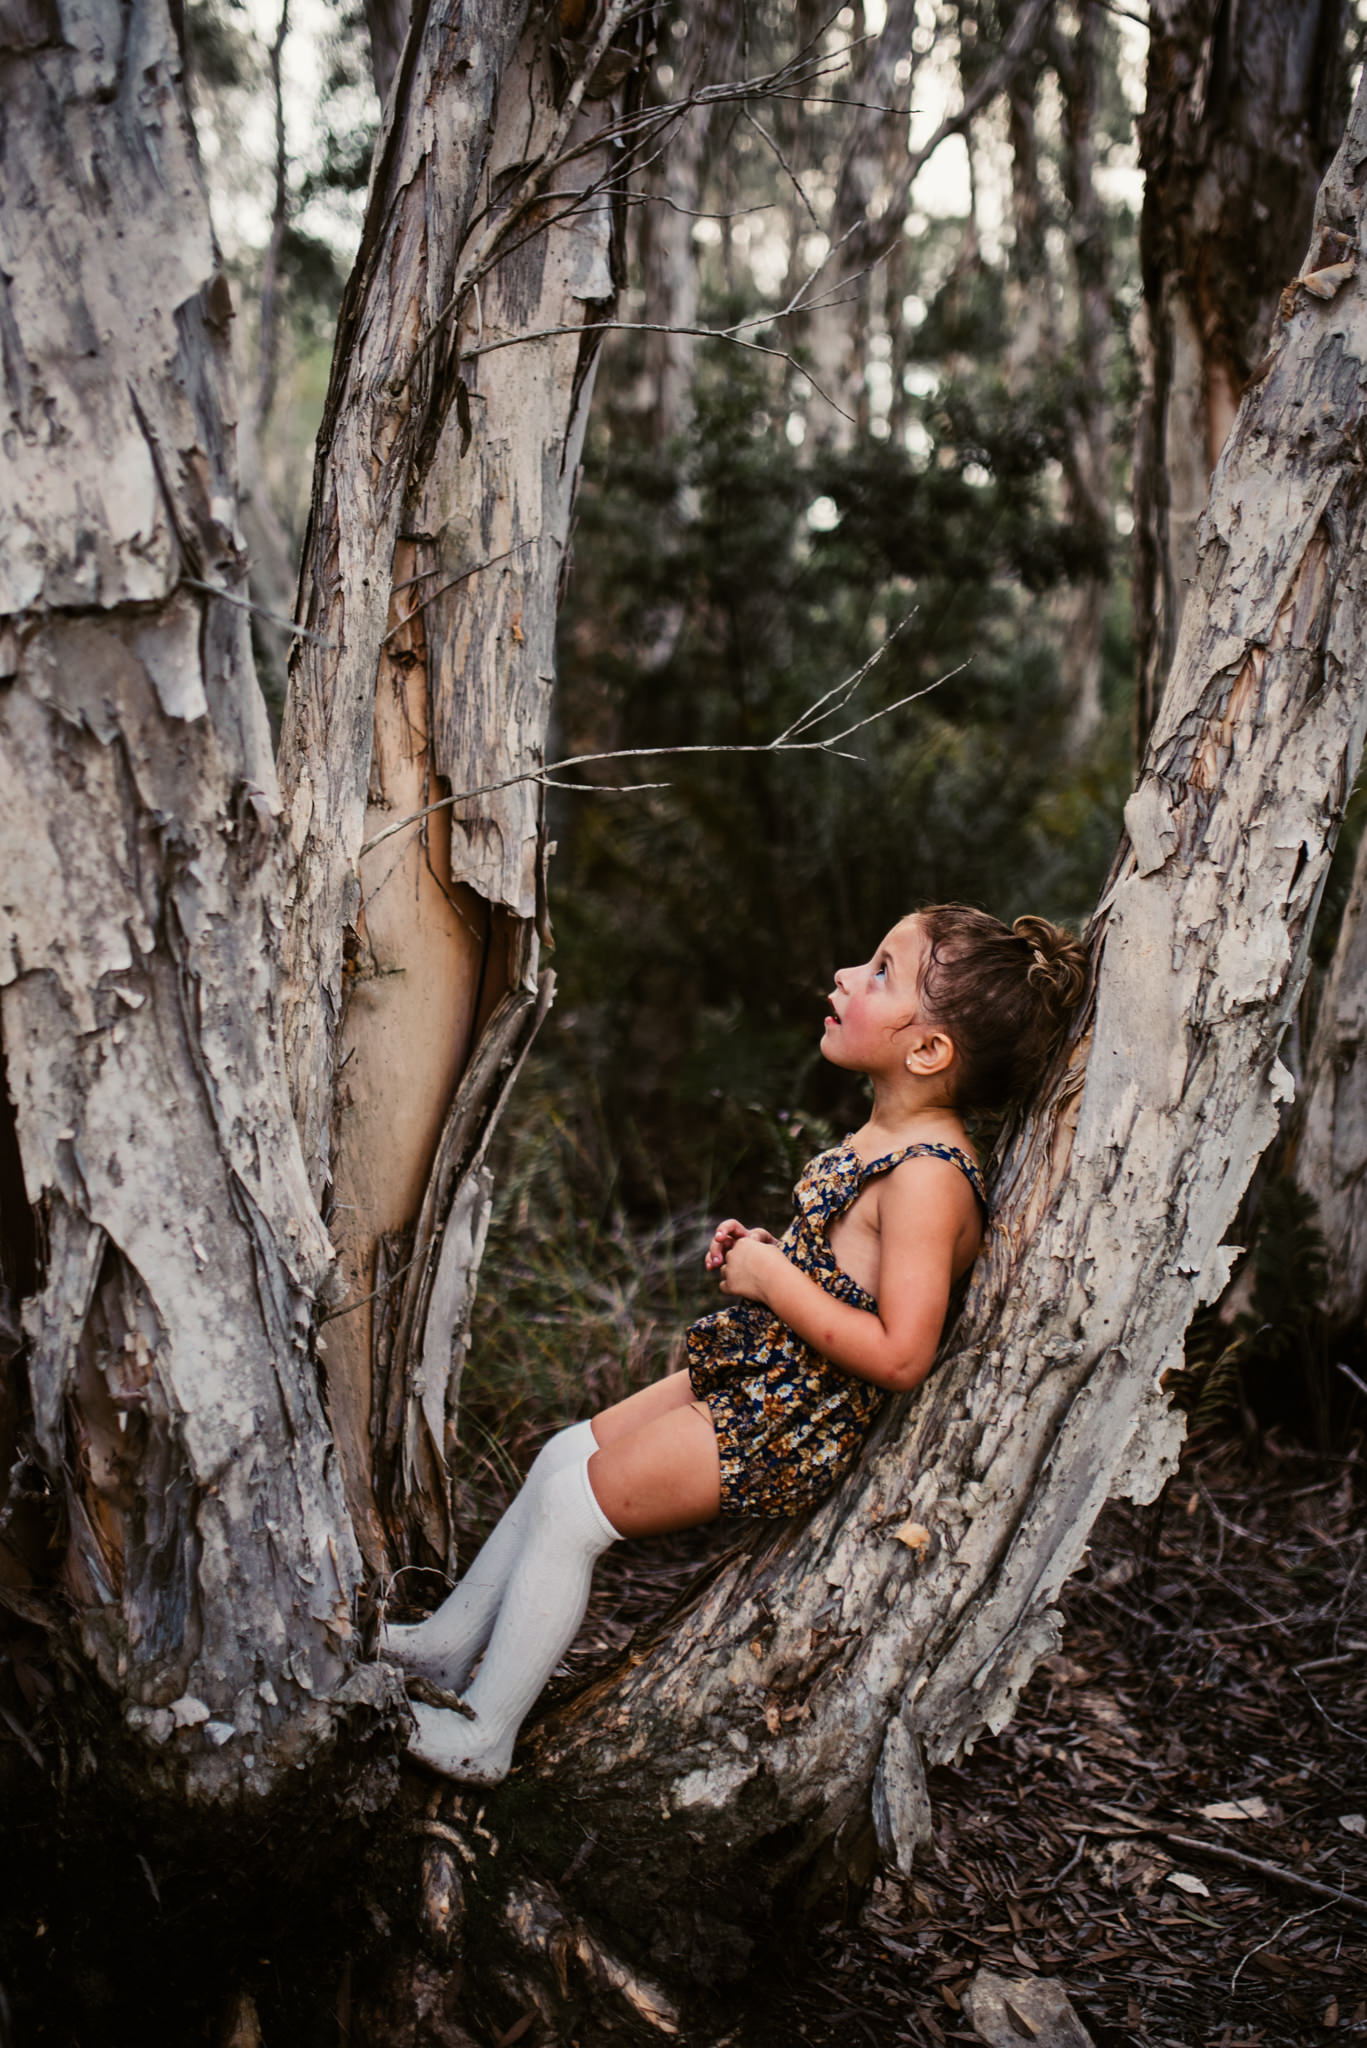 twyla jones photography - treasure coast florida - childrens adventure clothing commercial shoot--36.jpg